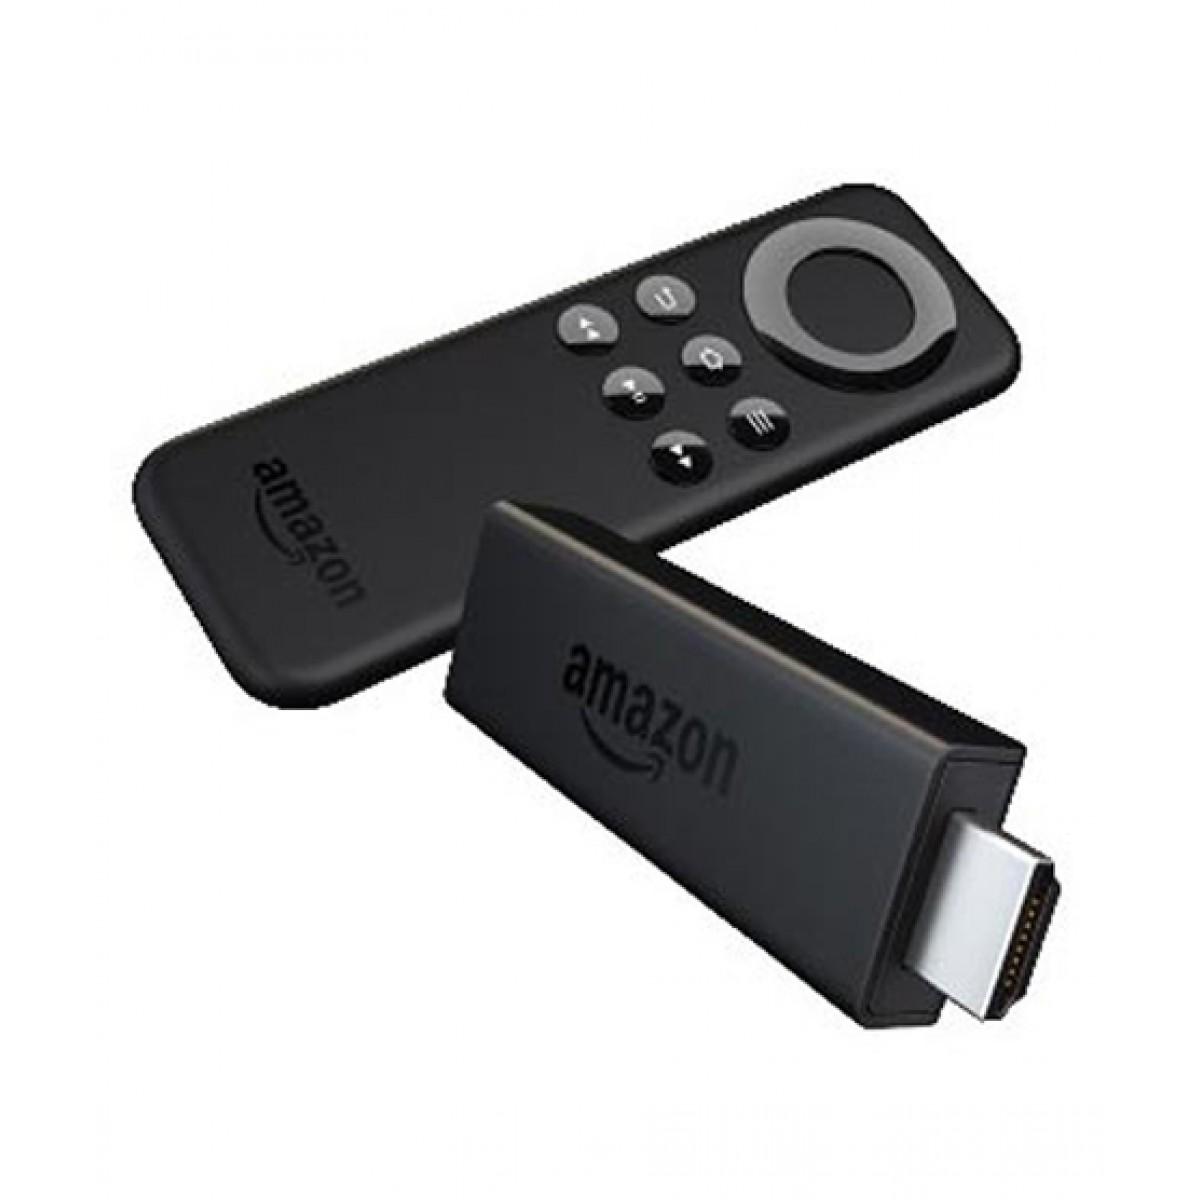 Amazon Fire TV Stick Streaming Media Player